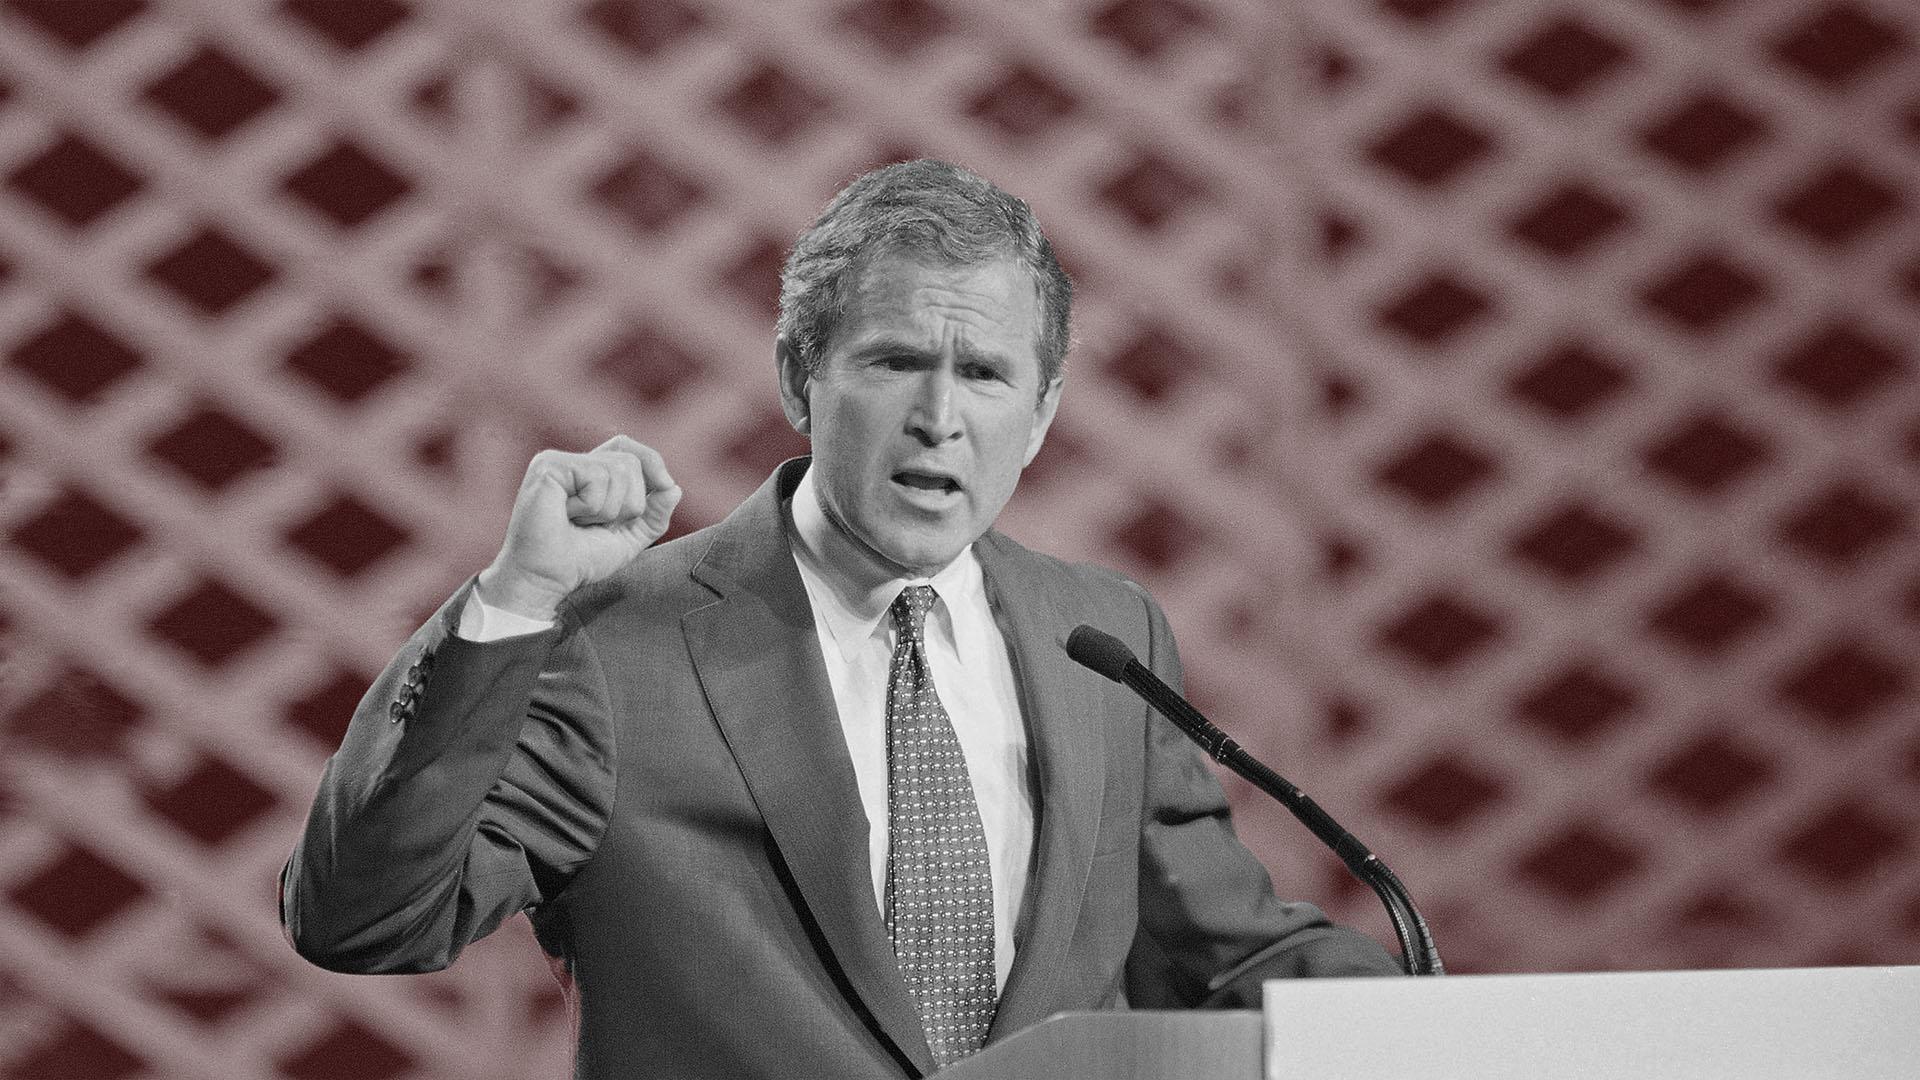 George W. Bush | Bio & Timeline